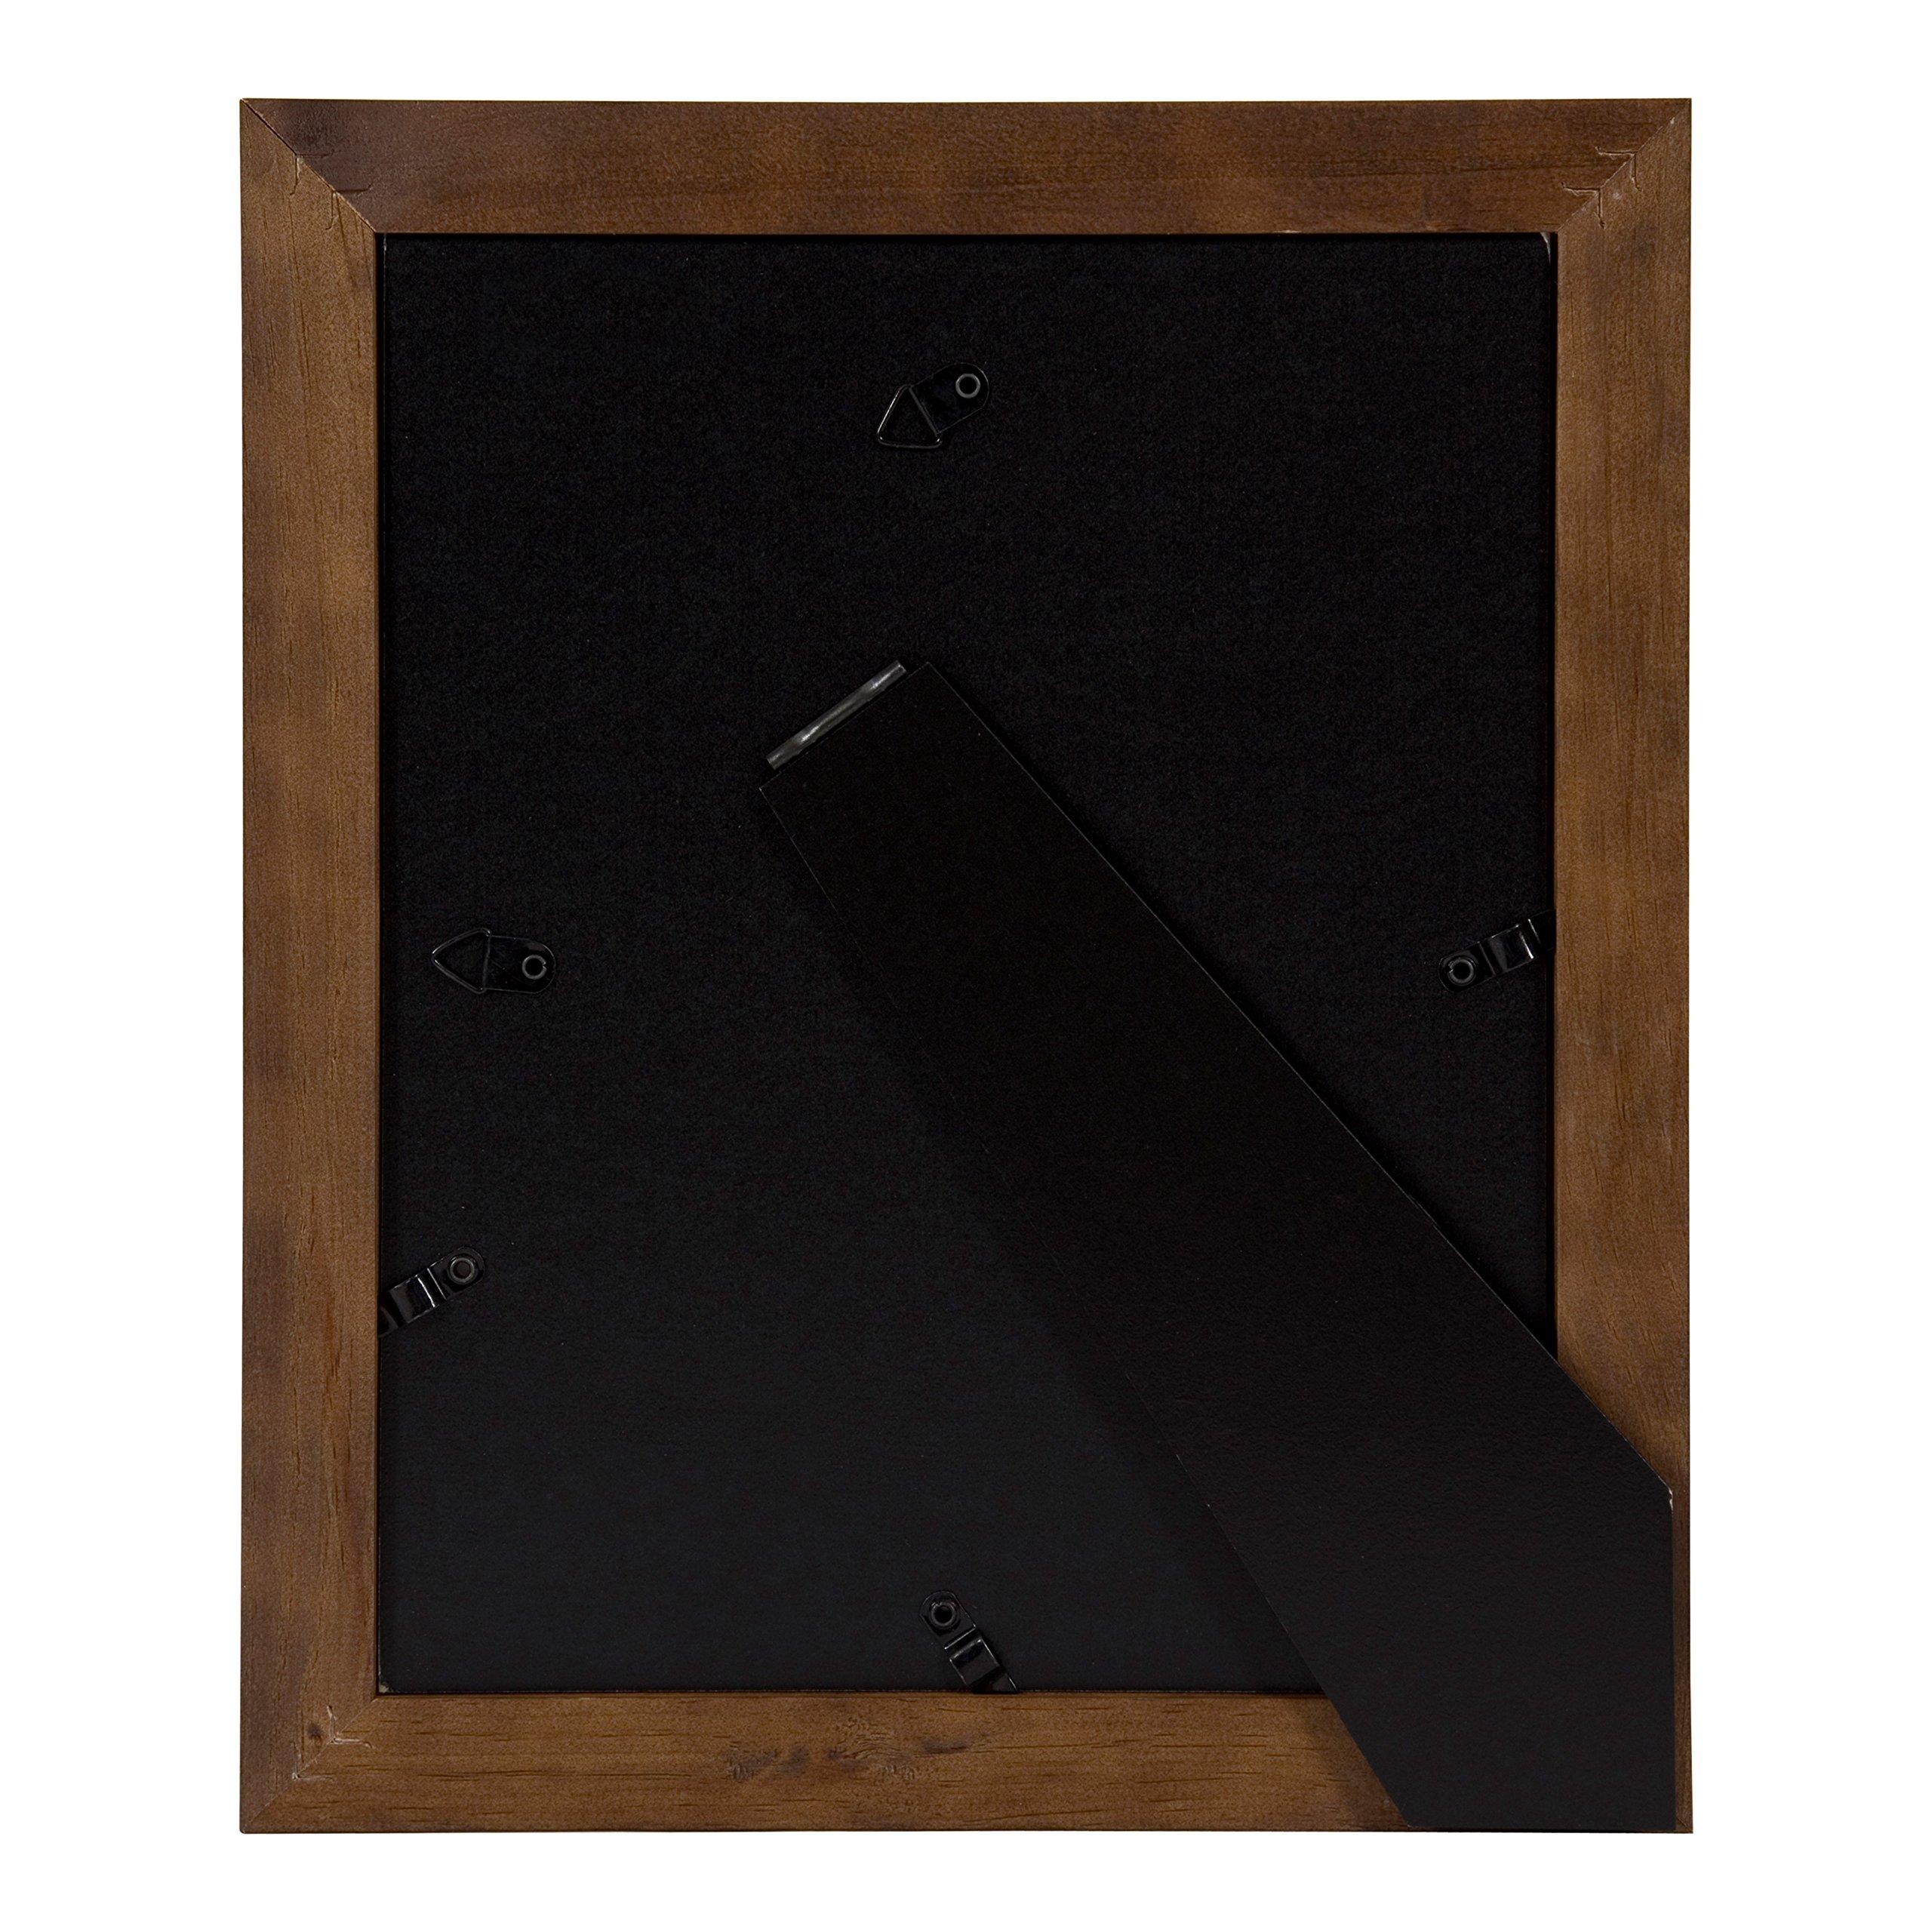 DesignOvation Kieva Solid Wood Picture Frames, Espresso Brown 8x10, Pack of 6 by DesignOvation (Image #5)